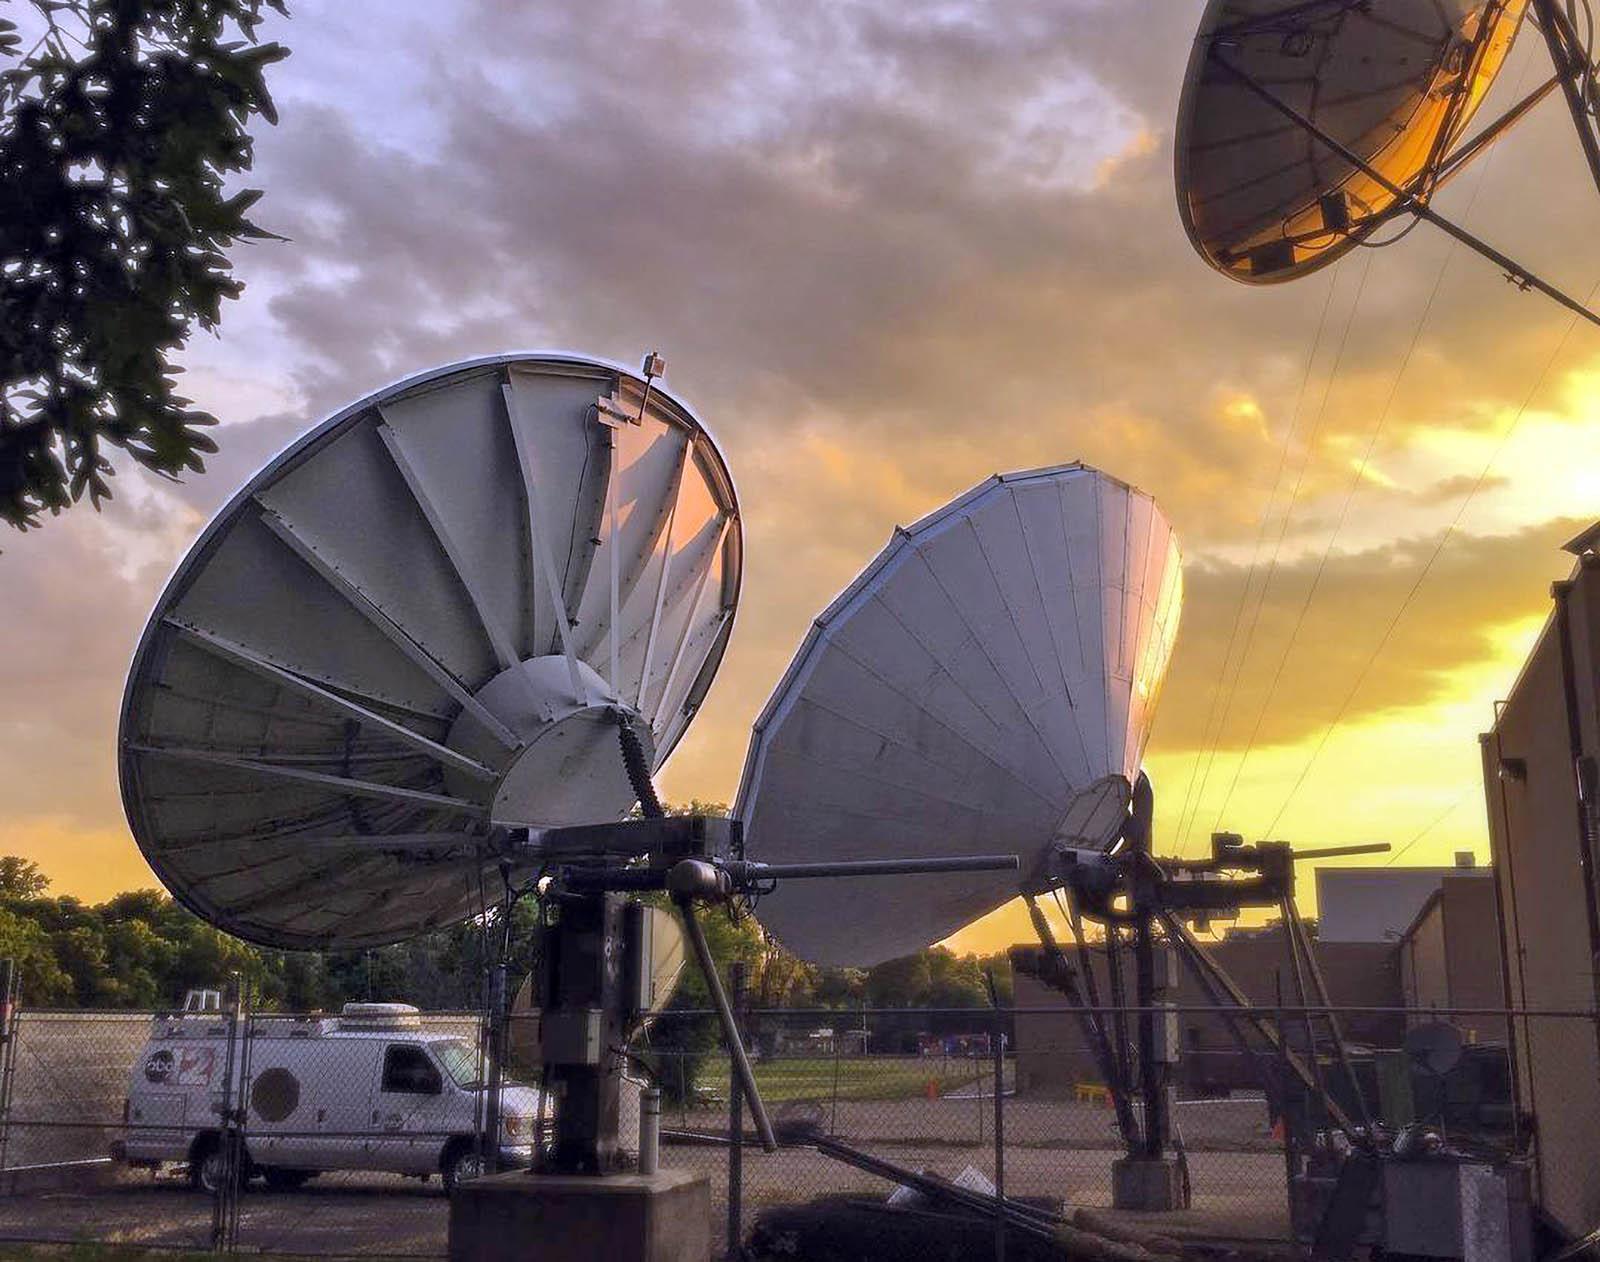 WJRT ABC12 News Satellite Dishes